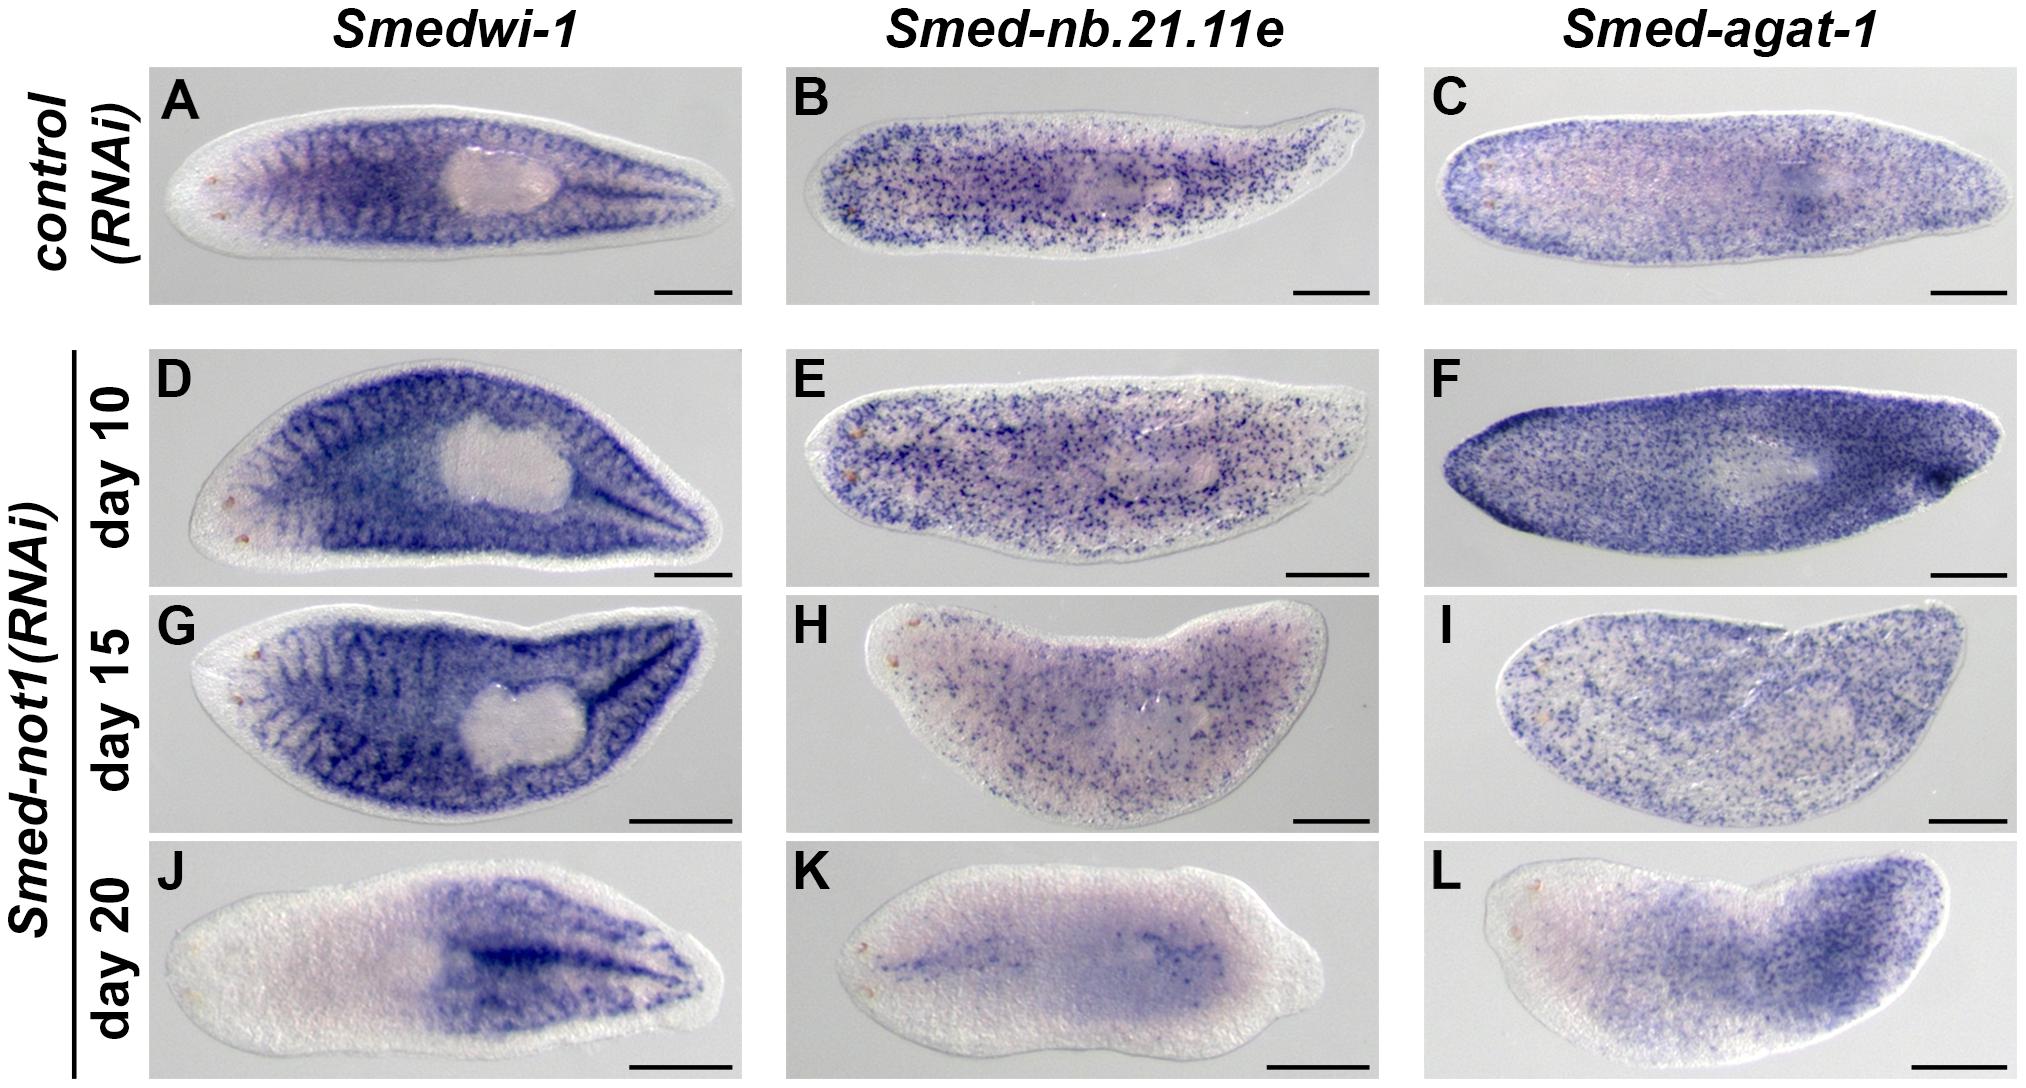 Dynamics of neoblasts and their progeny in <i>Smed-not1(RNAi)</i> animals.